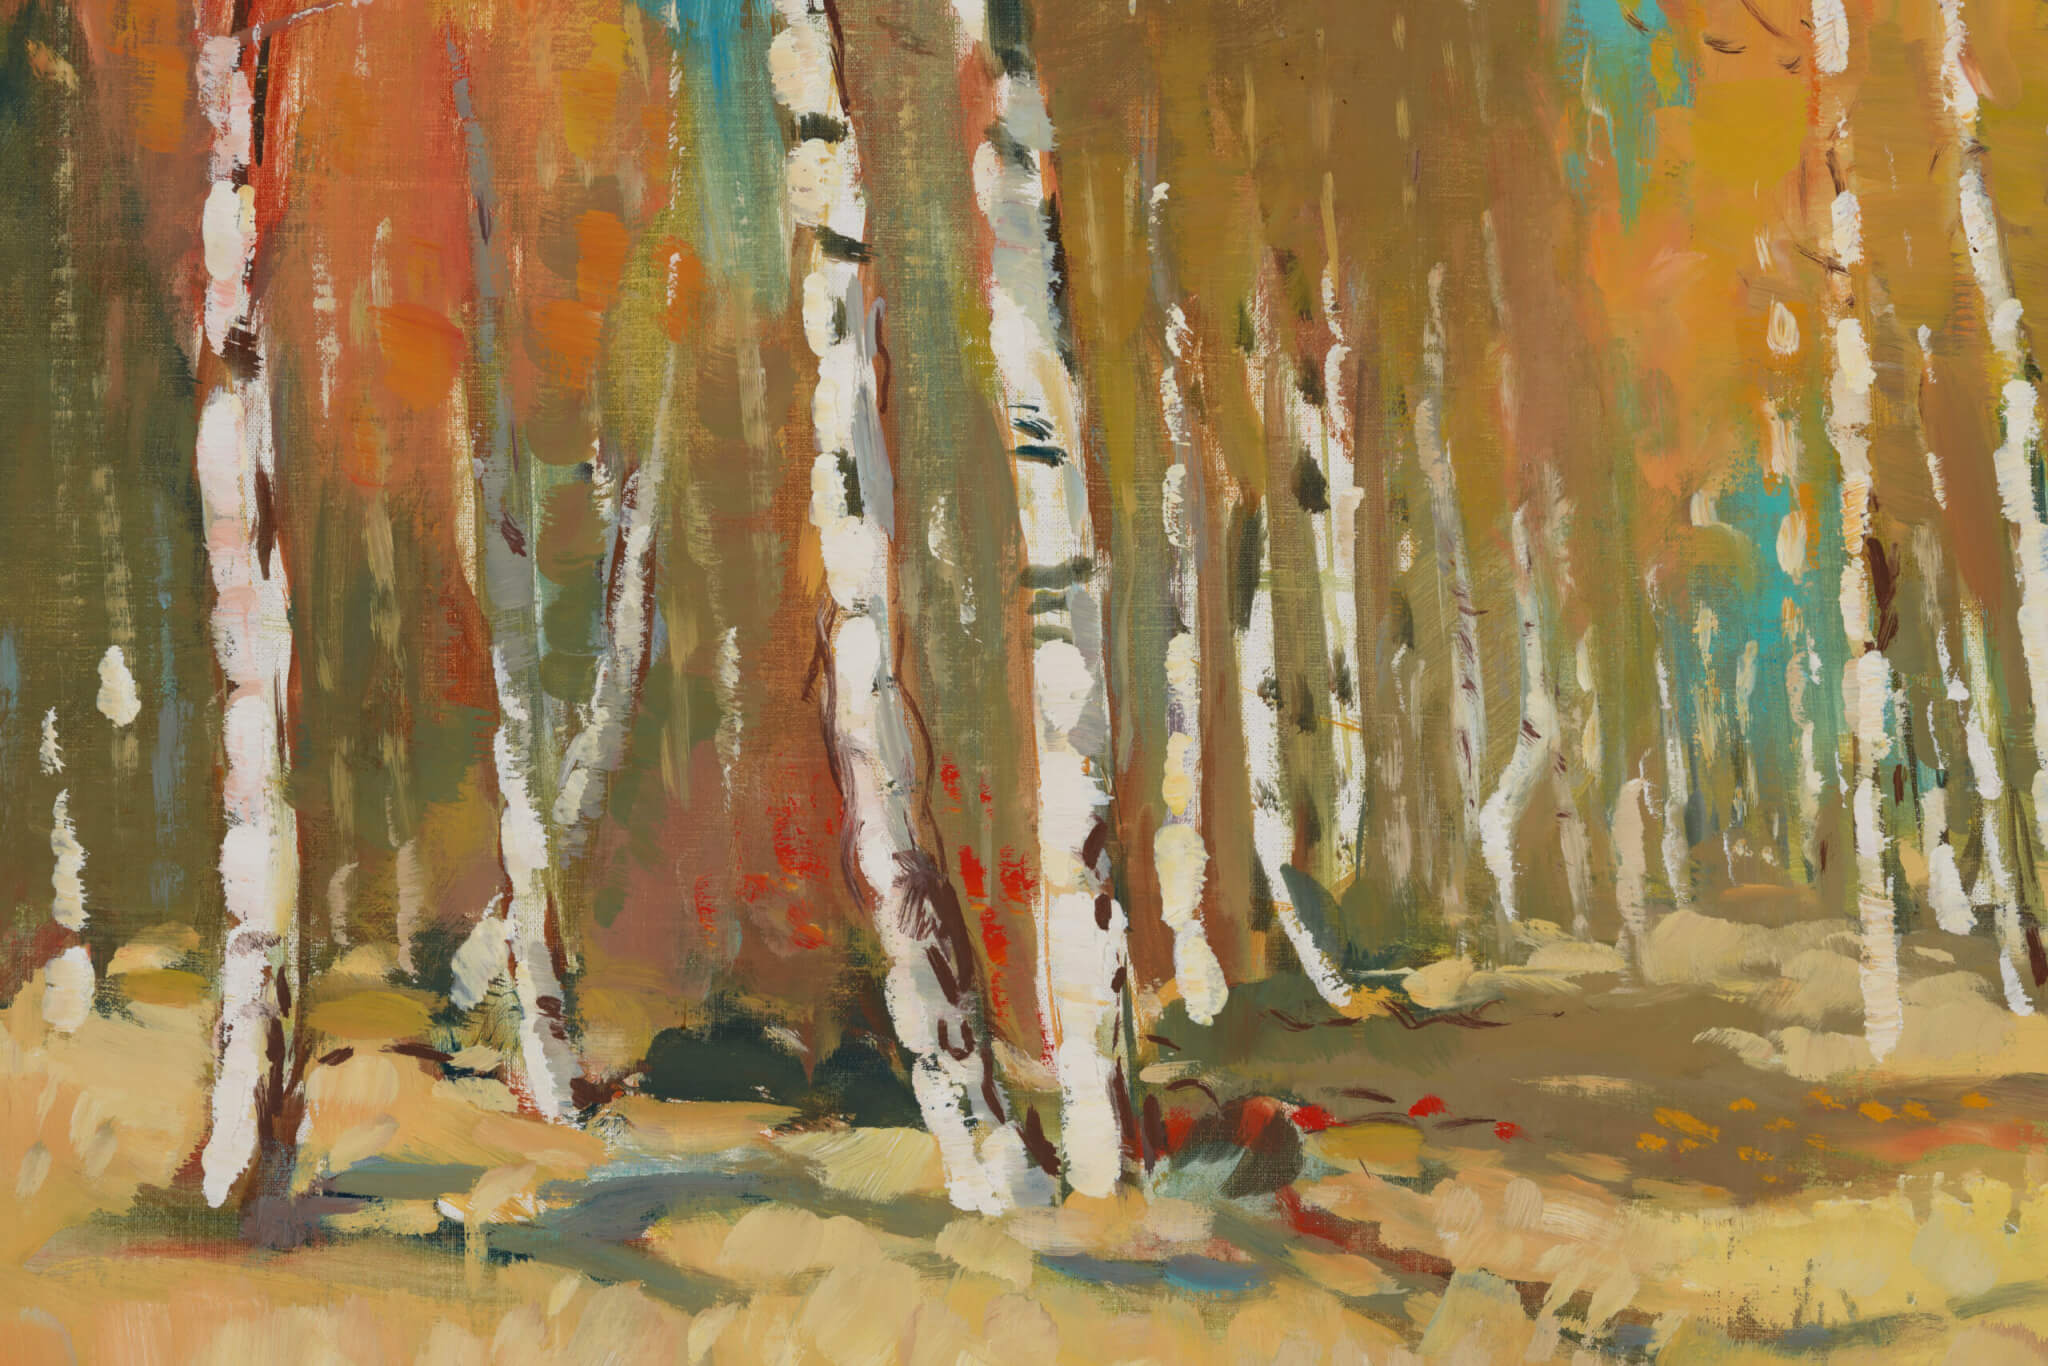 Richard-Uutmaa-Sügismaastik-Allee-kunstigalerii-sügisoksjon